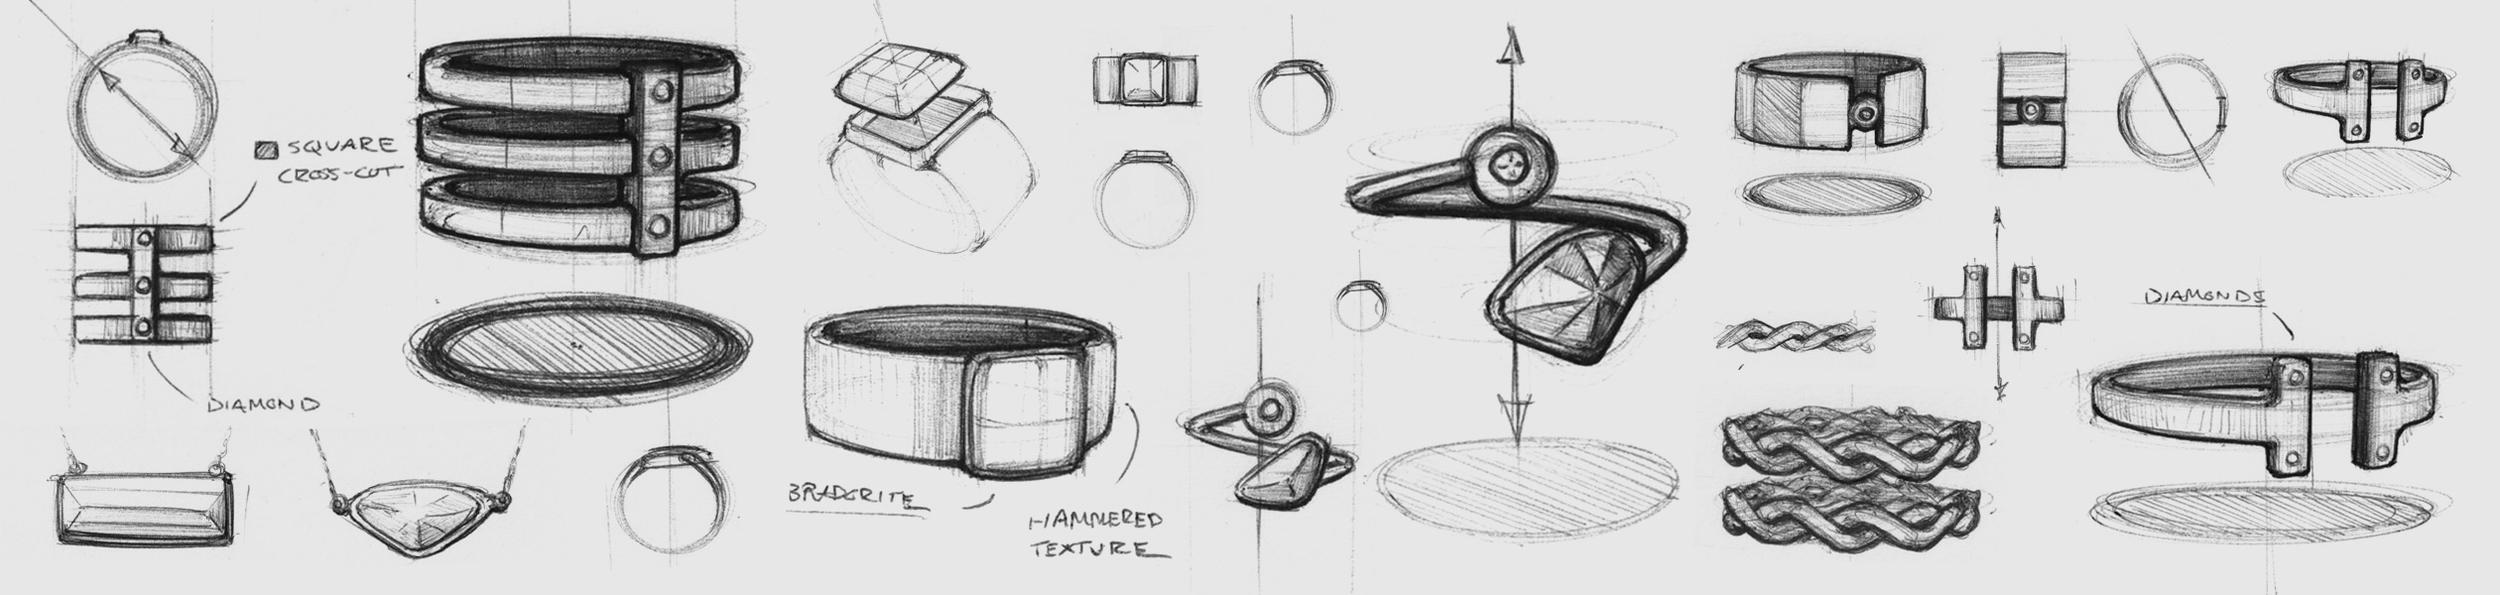 sketch_jewelry_2.jpg